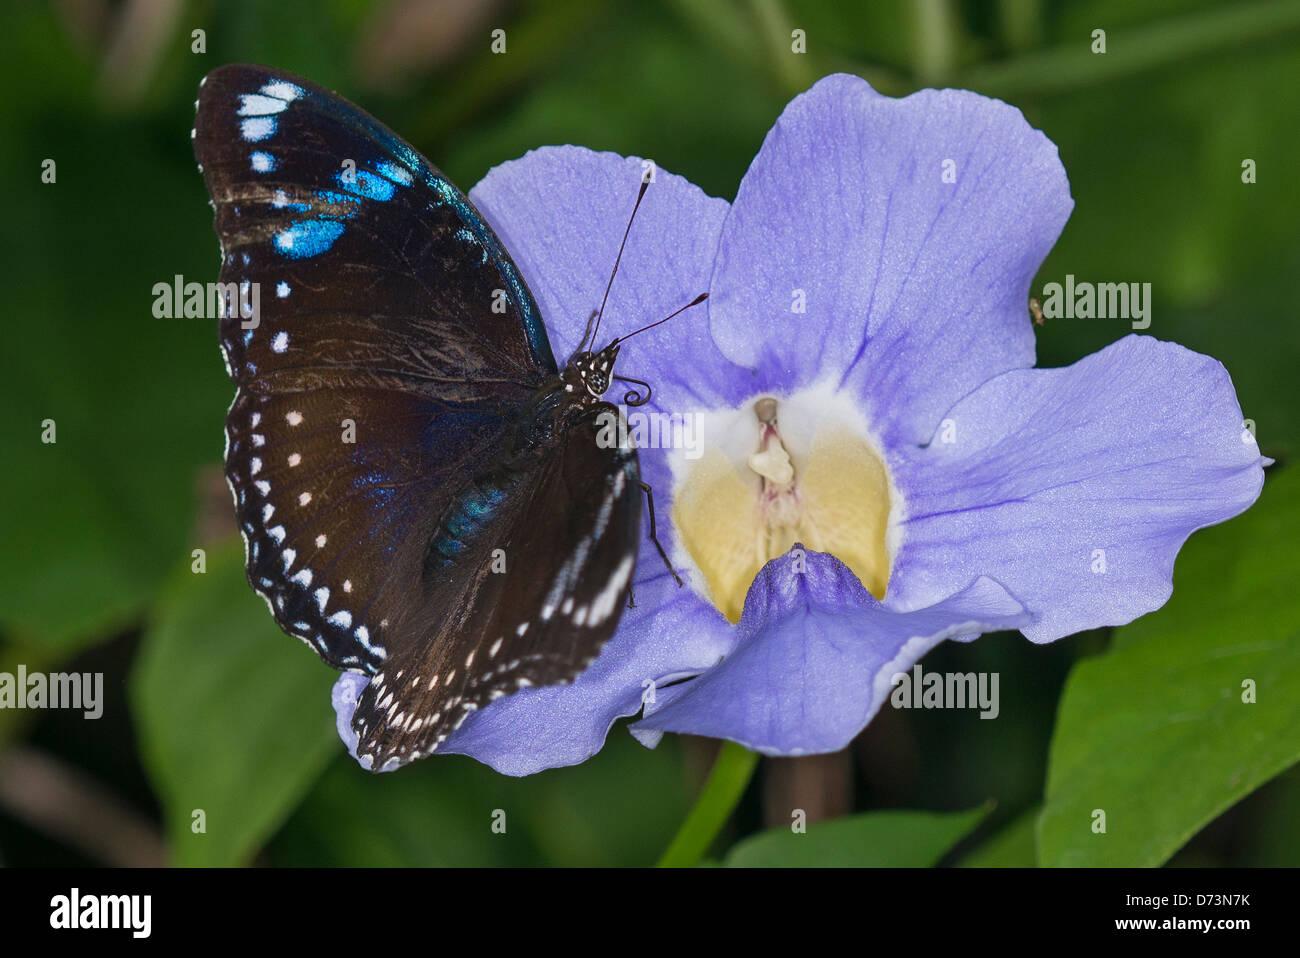 An adult Tanzanian Diadem butterfly - Stock Image